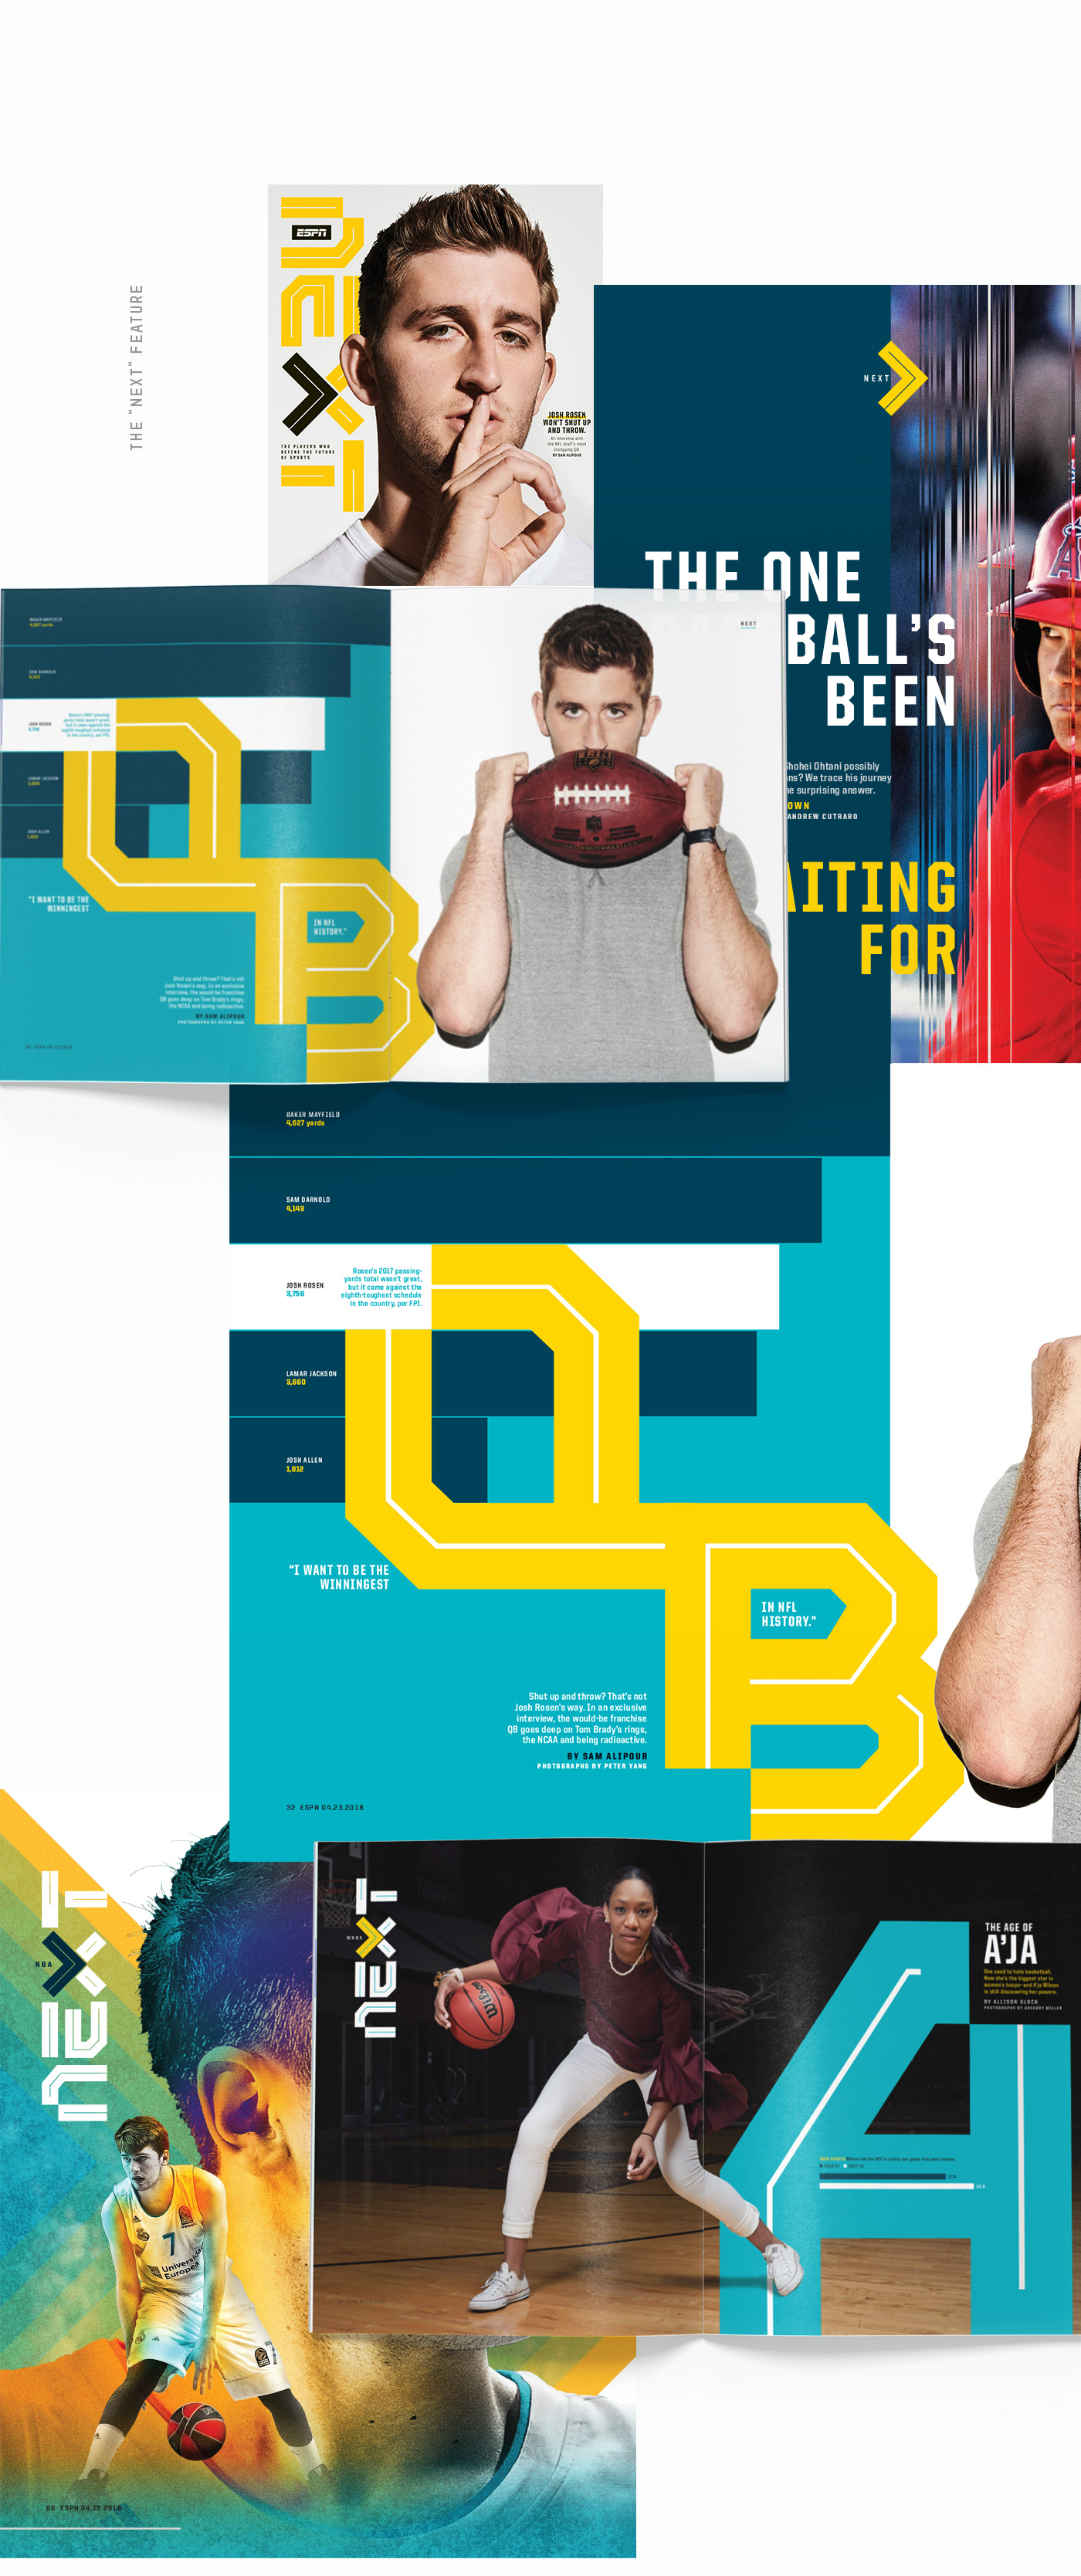 Typographic Illustration for ESPN NEXT